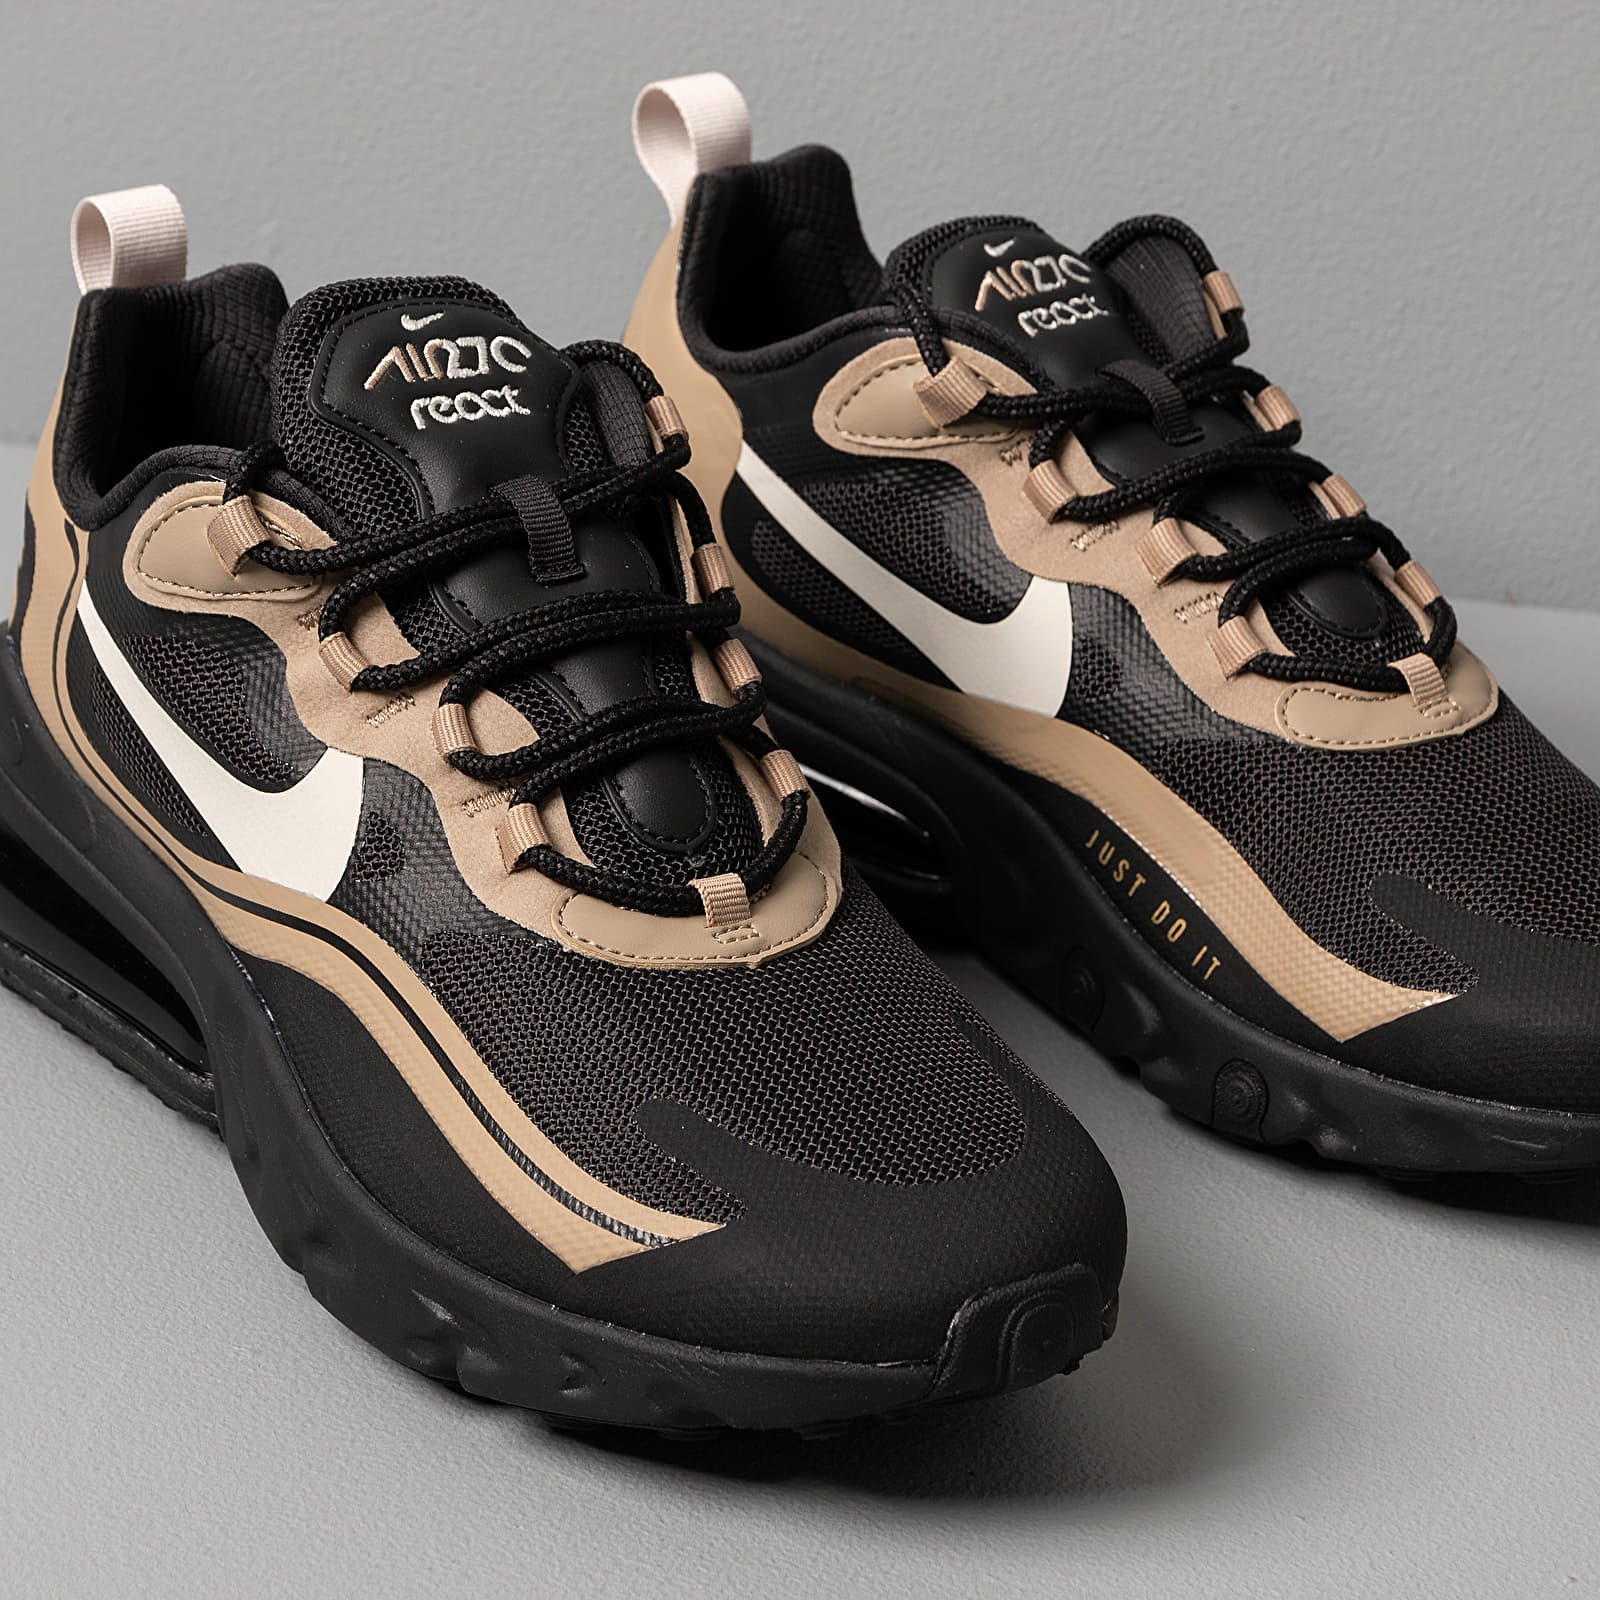 Nike Air Max 270 React Black Light Bone Khaki Metallic Gold | Footshop